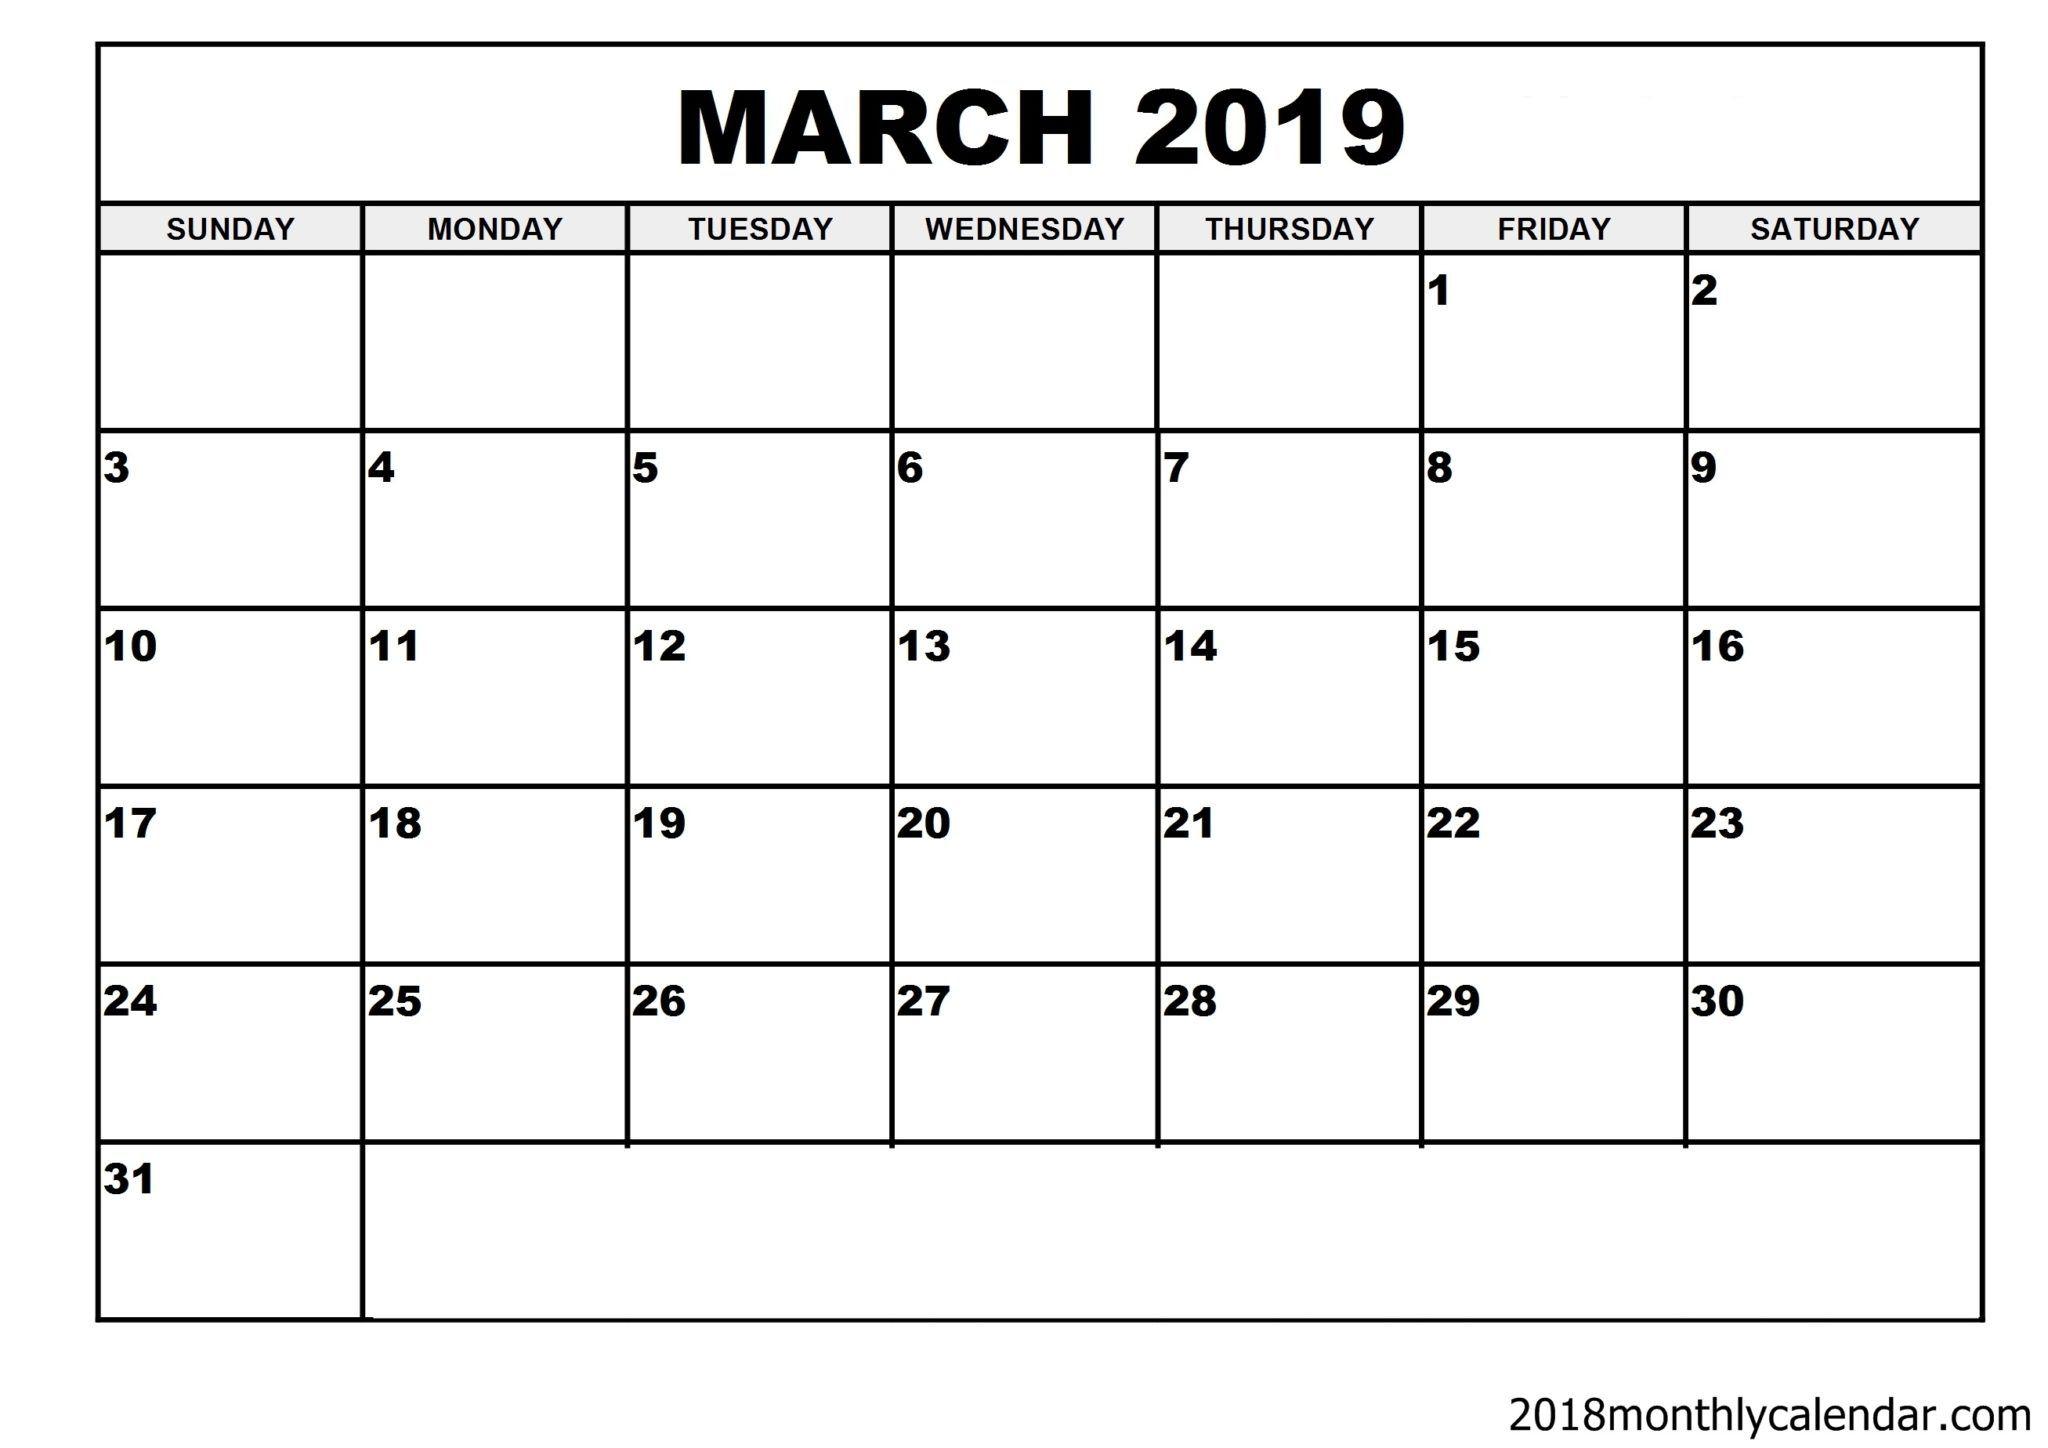 Download March 2019 Calendar – Blank Template - Editable Calendar with regard to Free Fillable Blank Calendar Templates